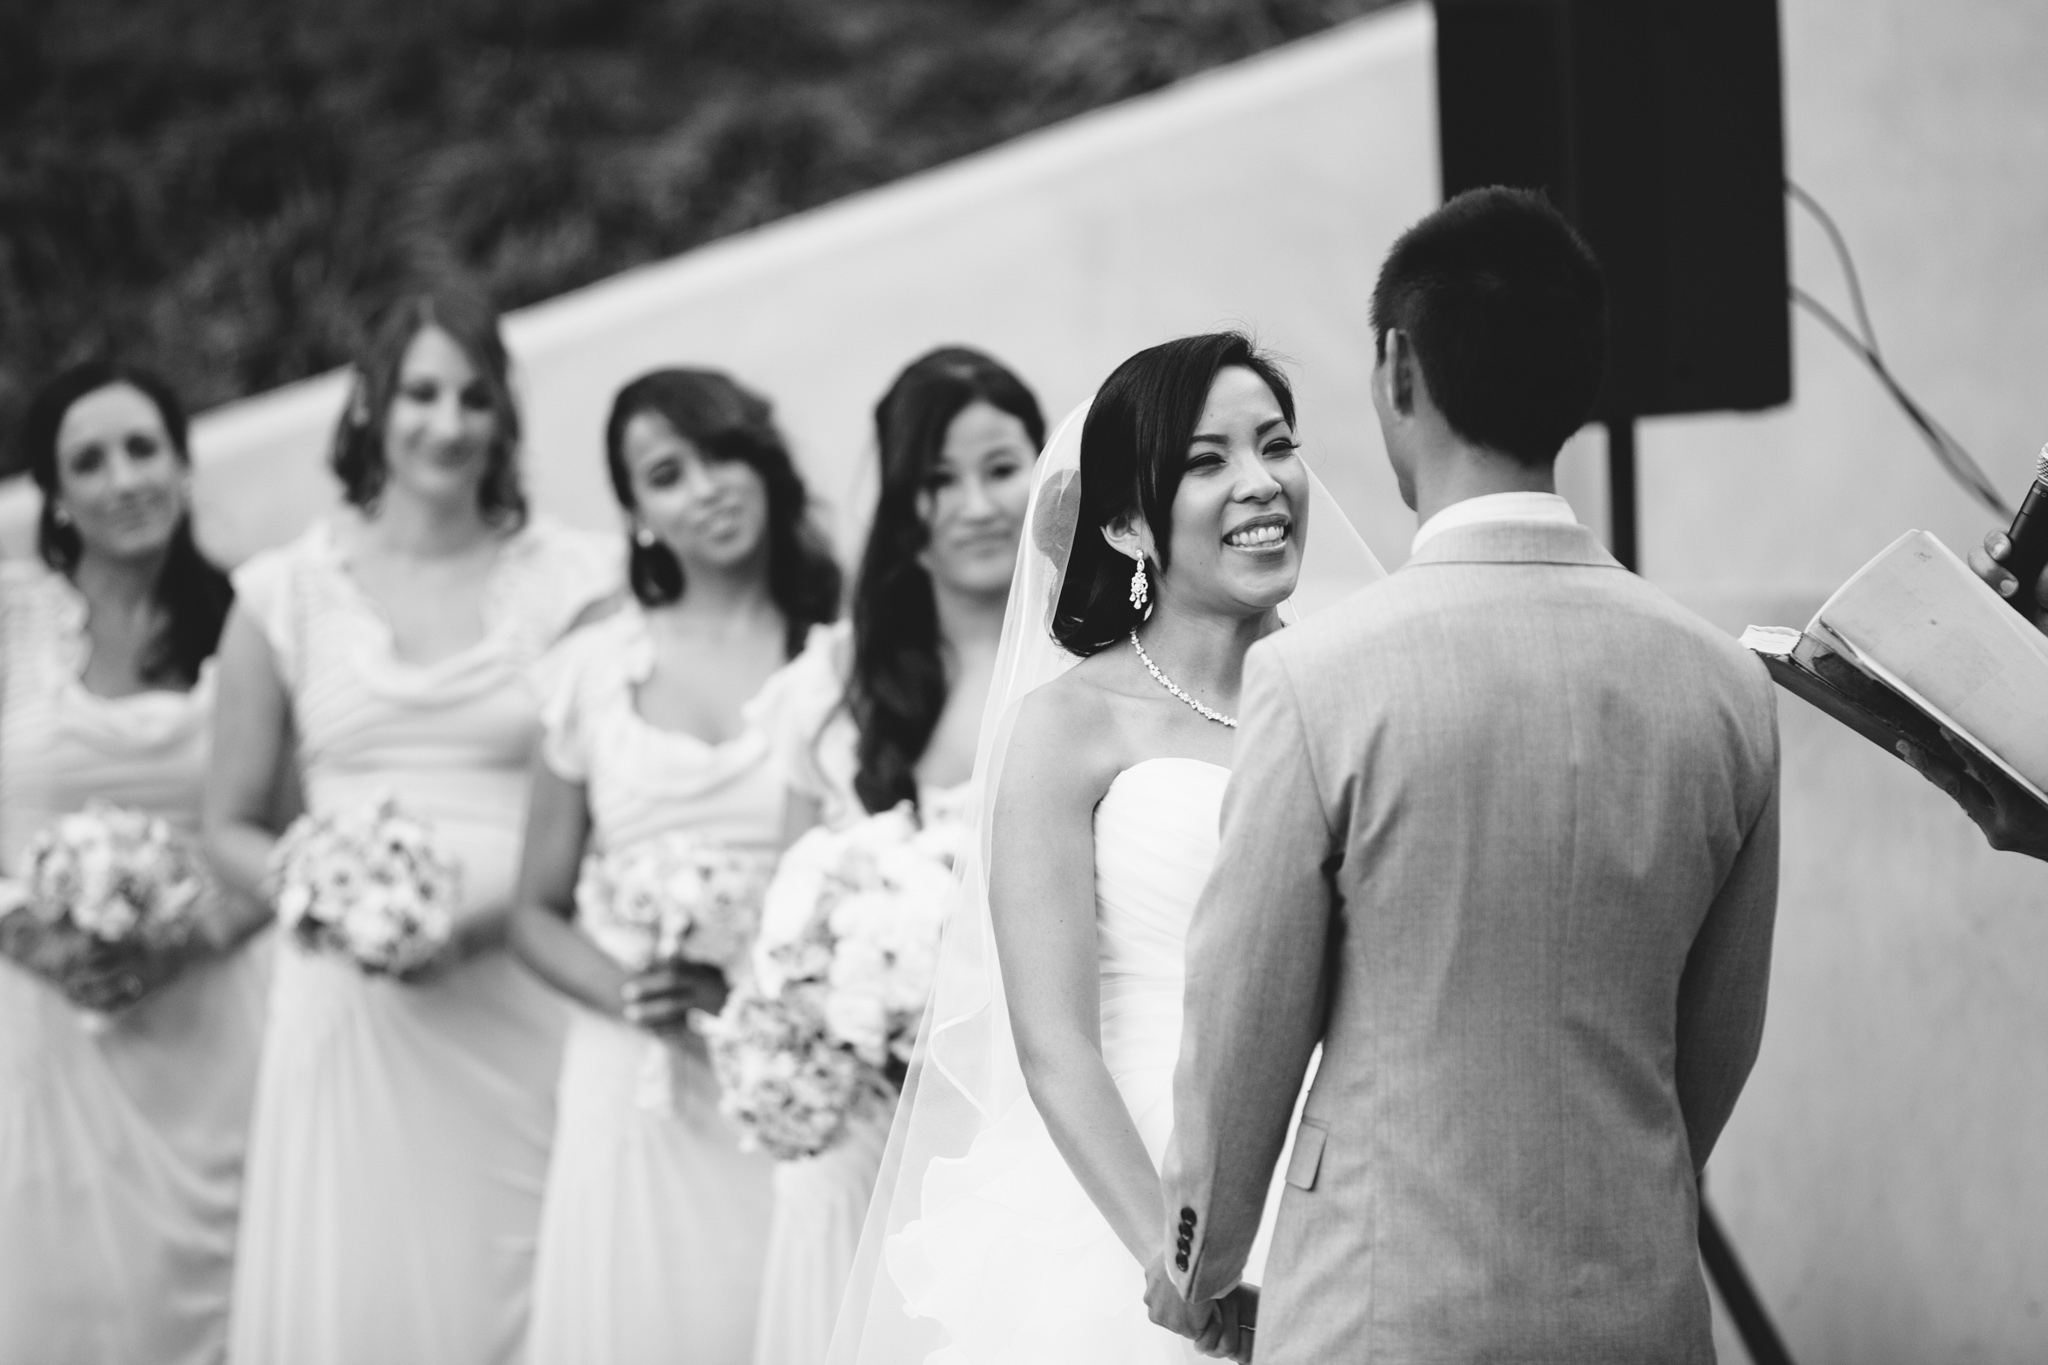 skirball cultural center wedding-140.jpg